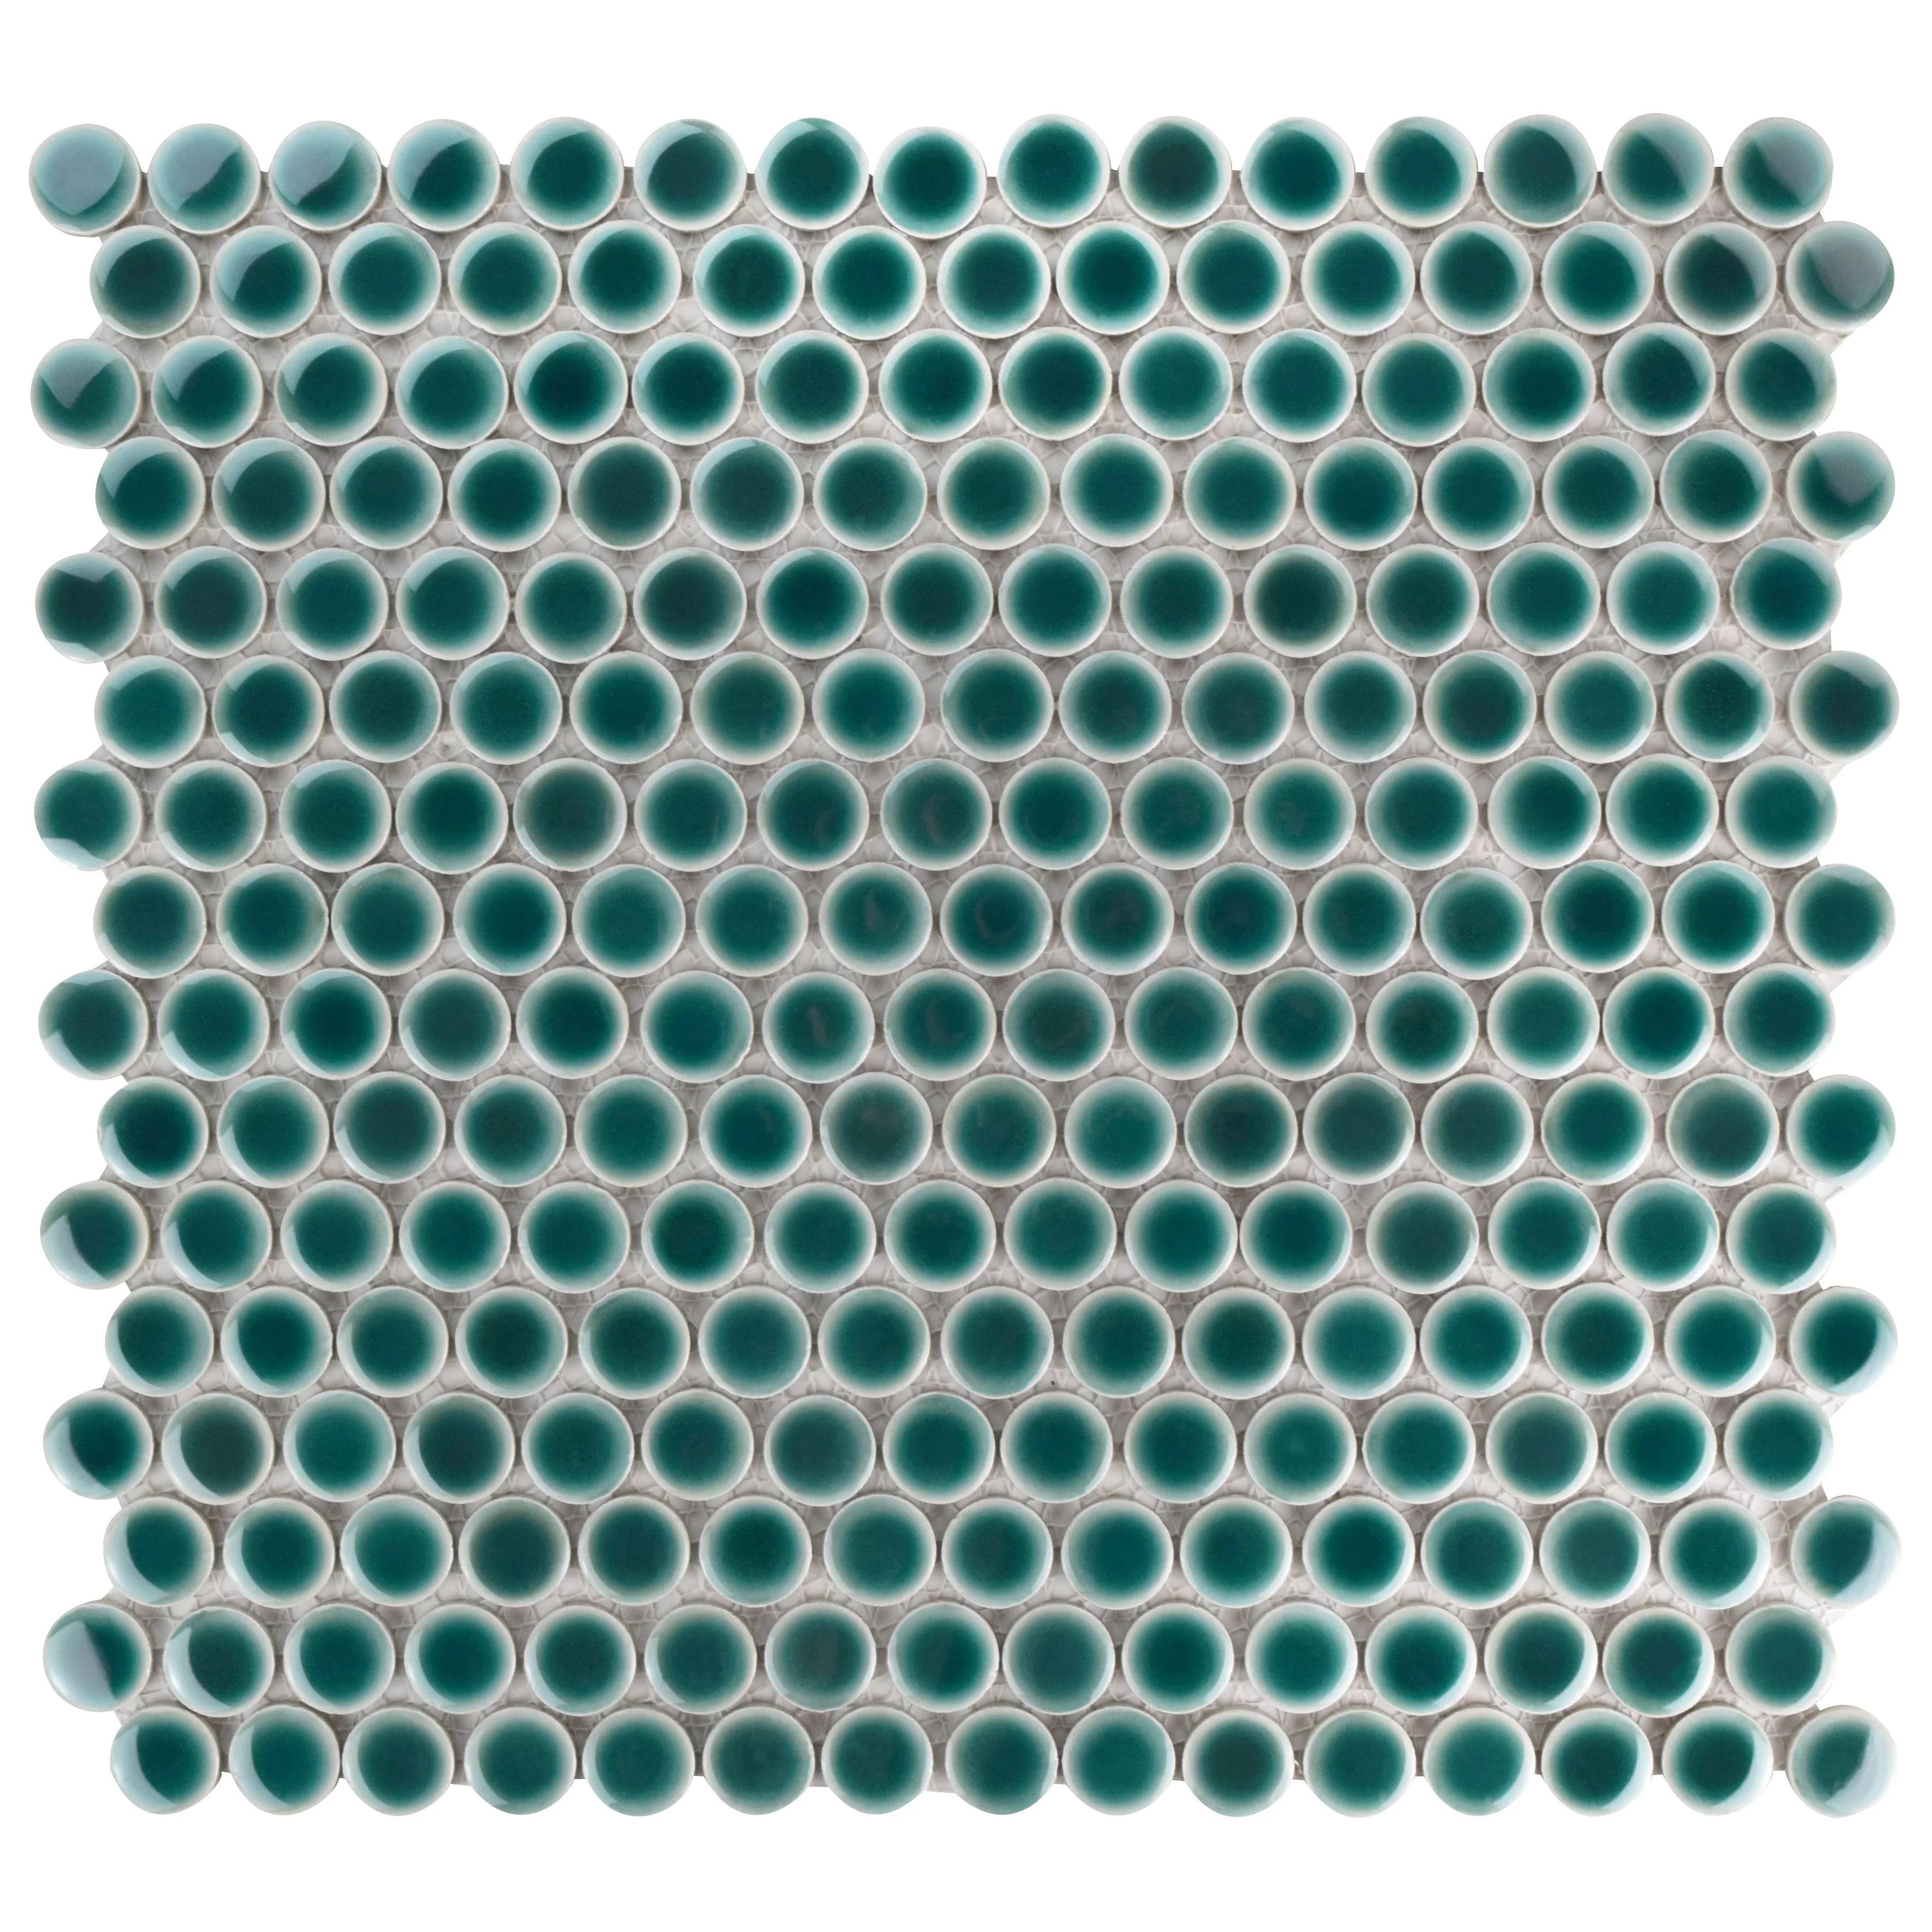 penny round floor tiles wall tiles